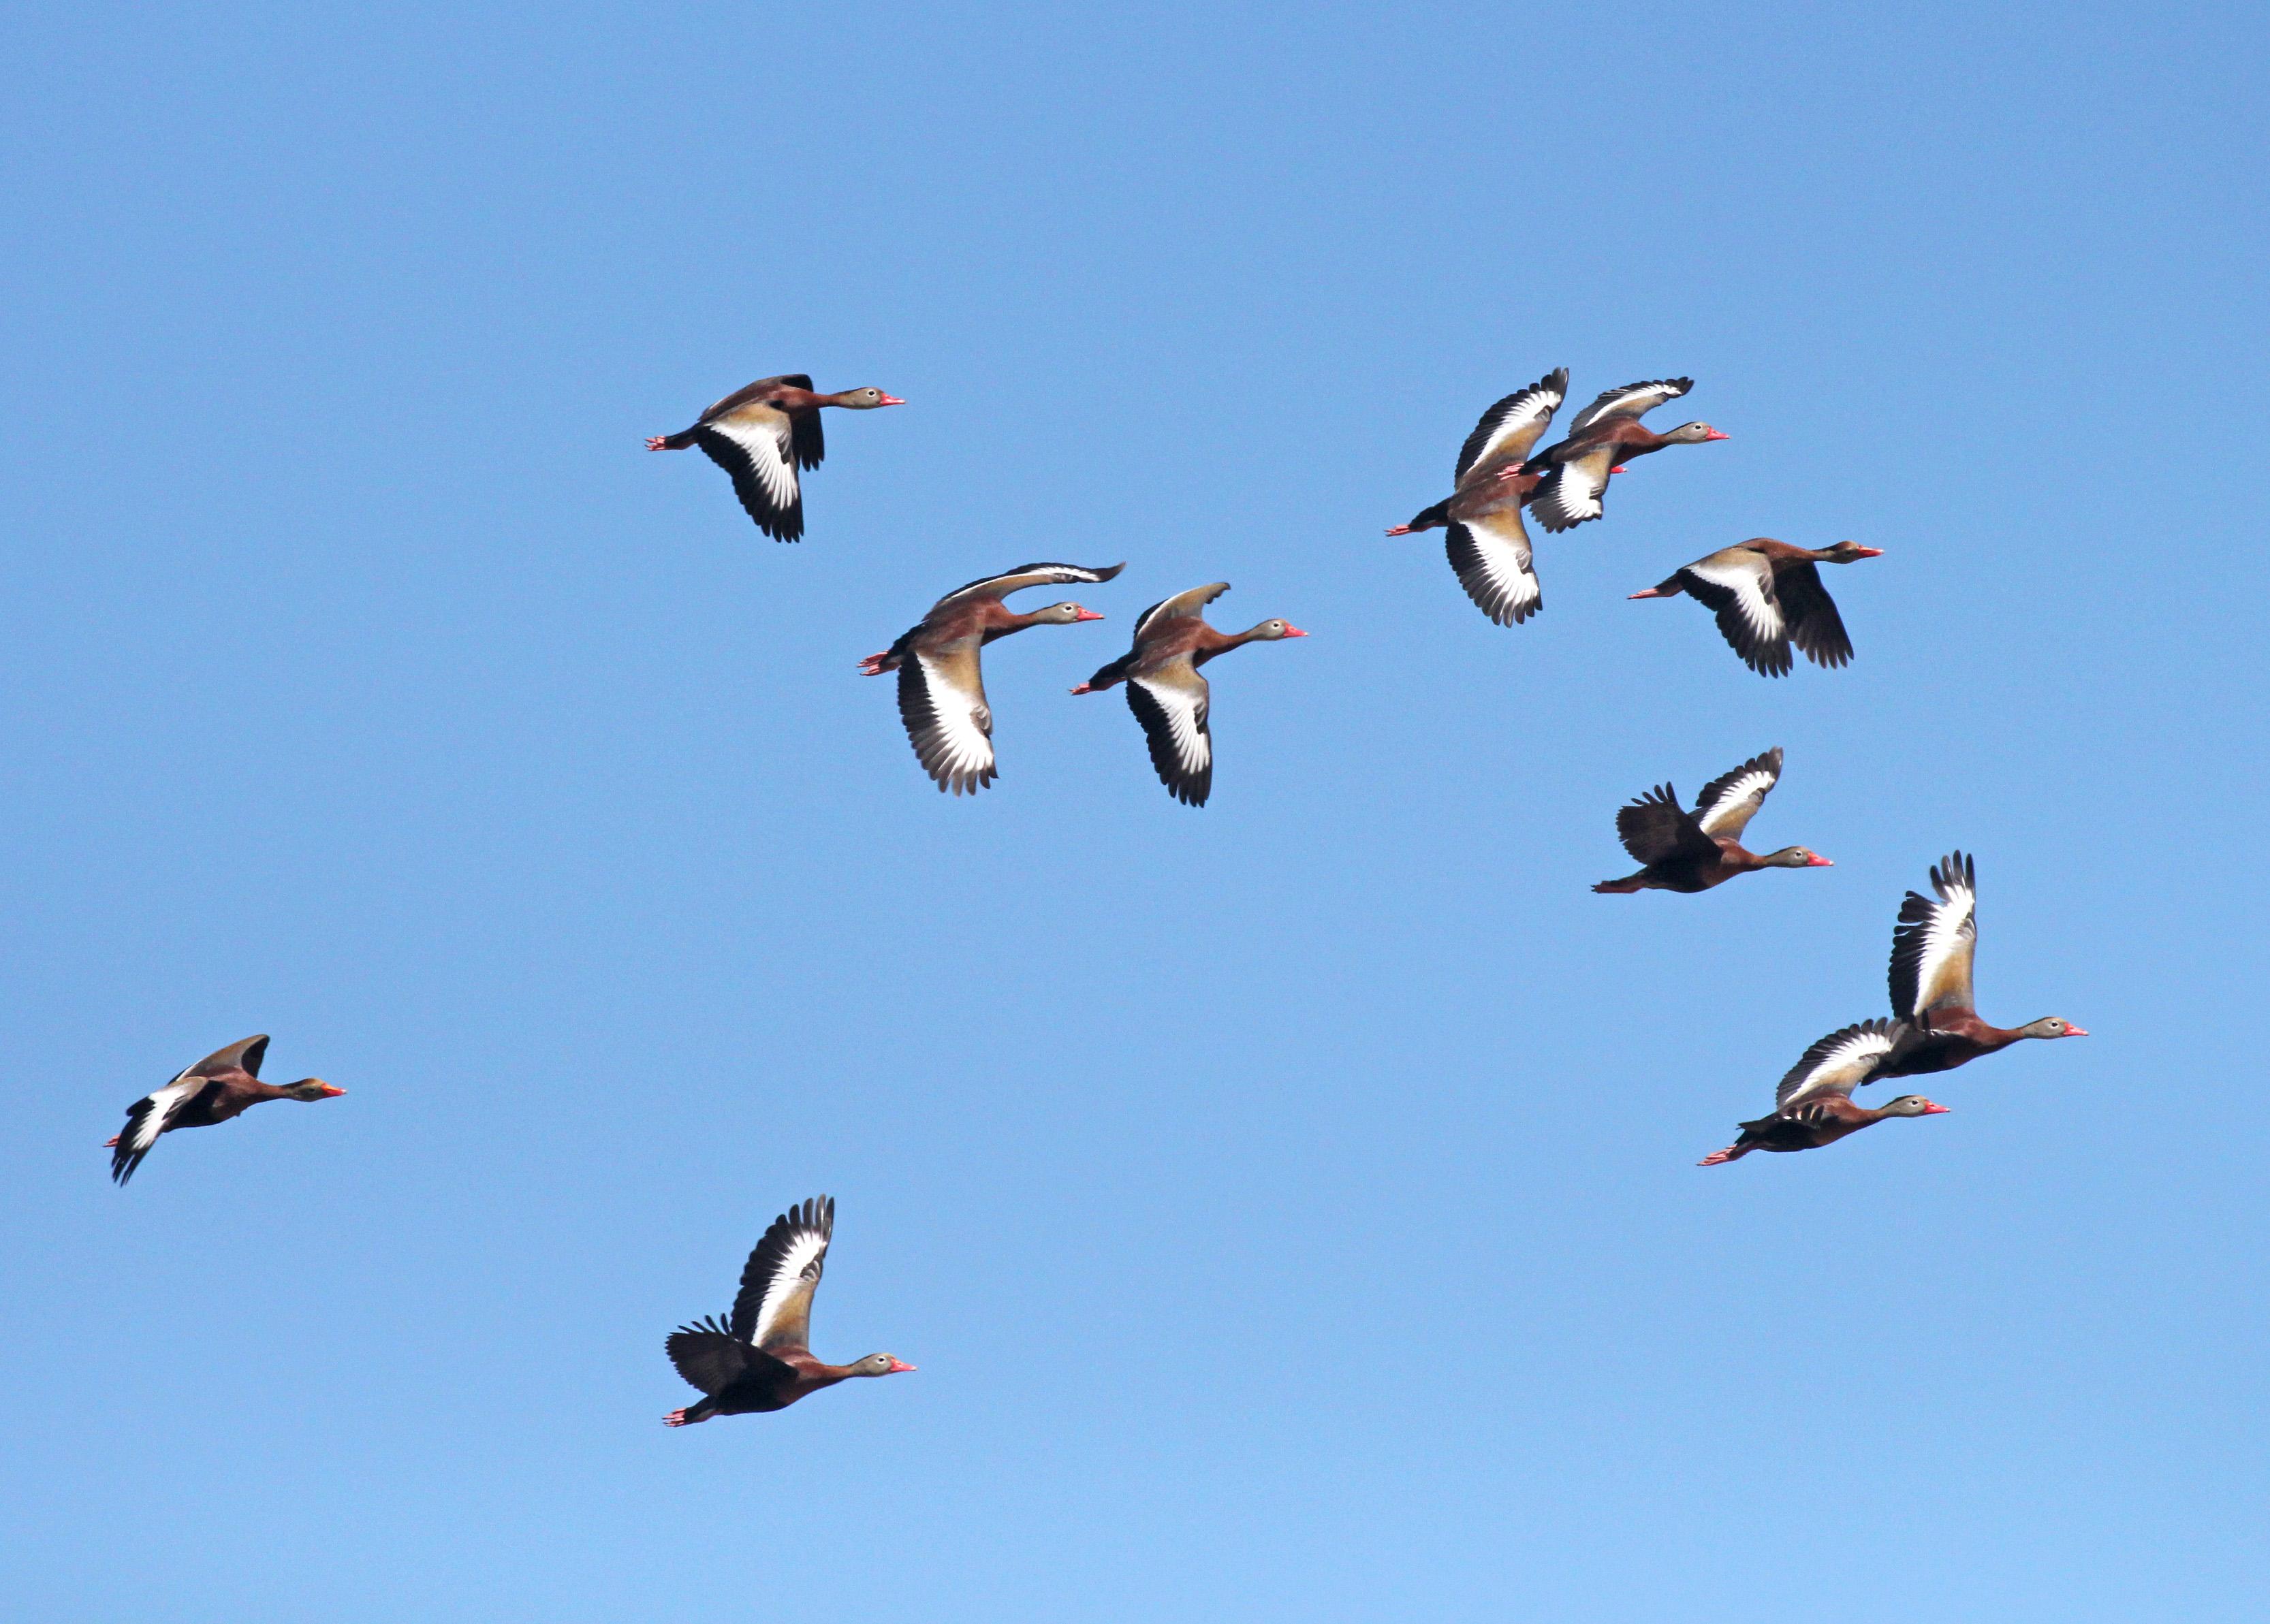 003 - black-bellied whistling-ducks (5-10-2015) las cienegas nca, pima co, az -01 photo